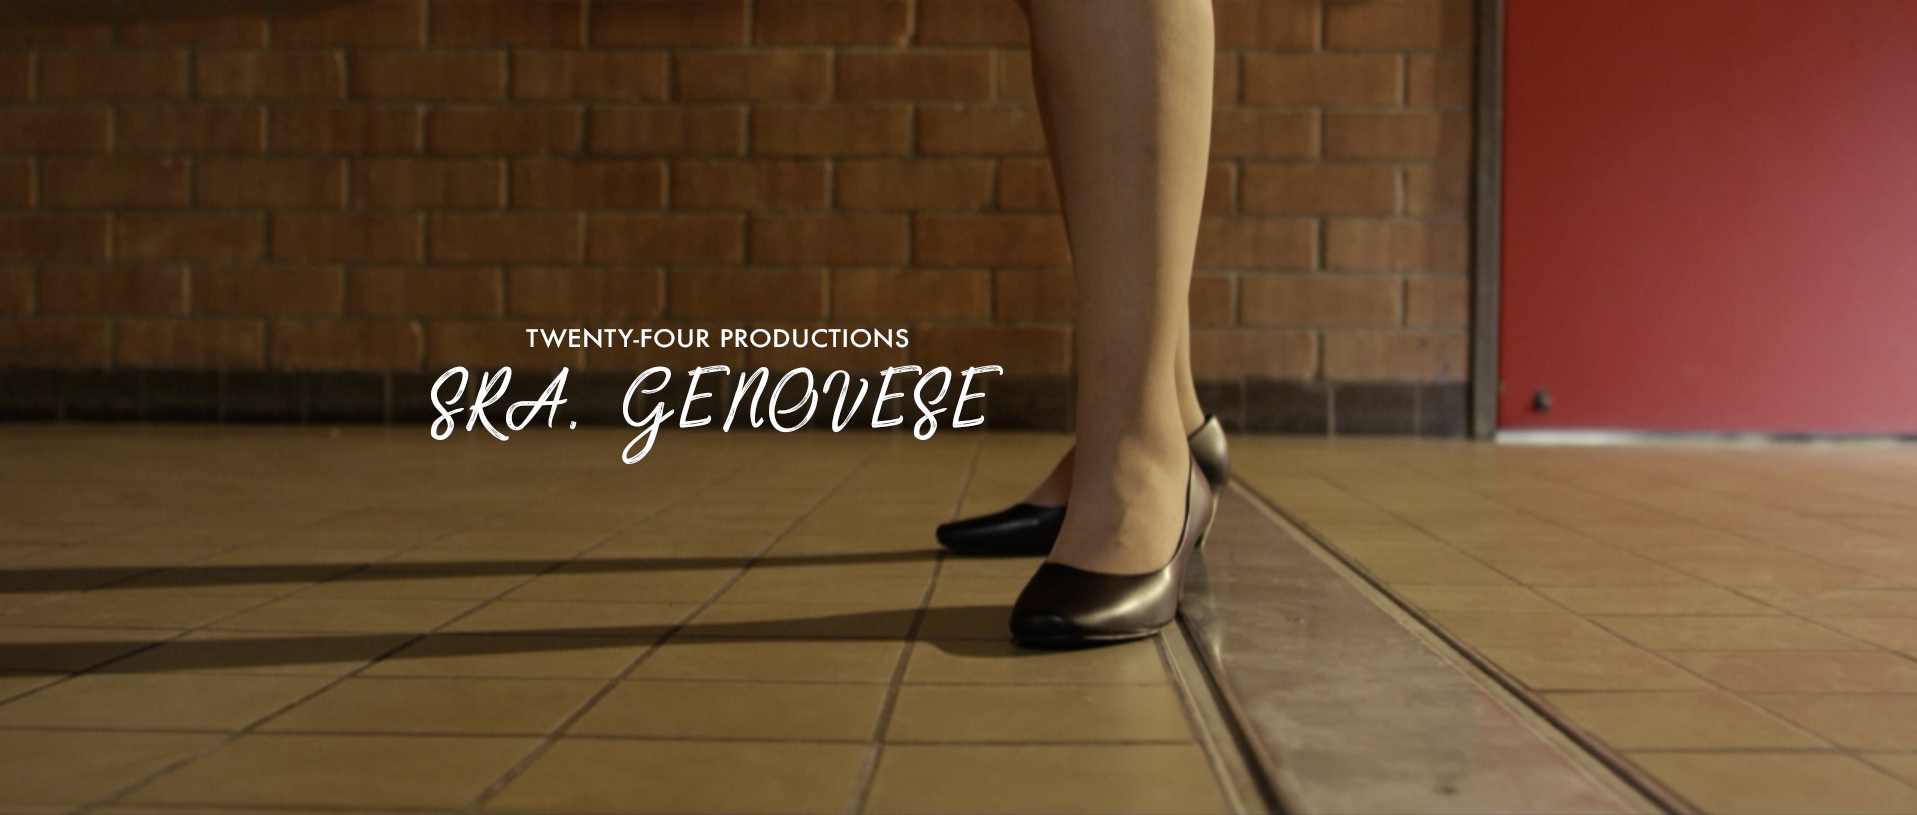 Sra. Genovese